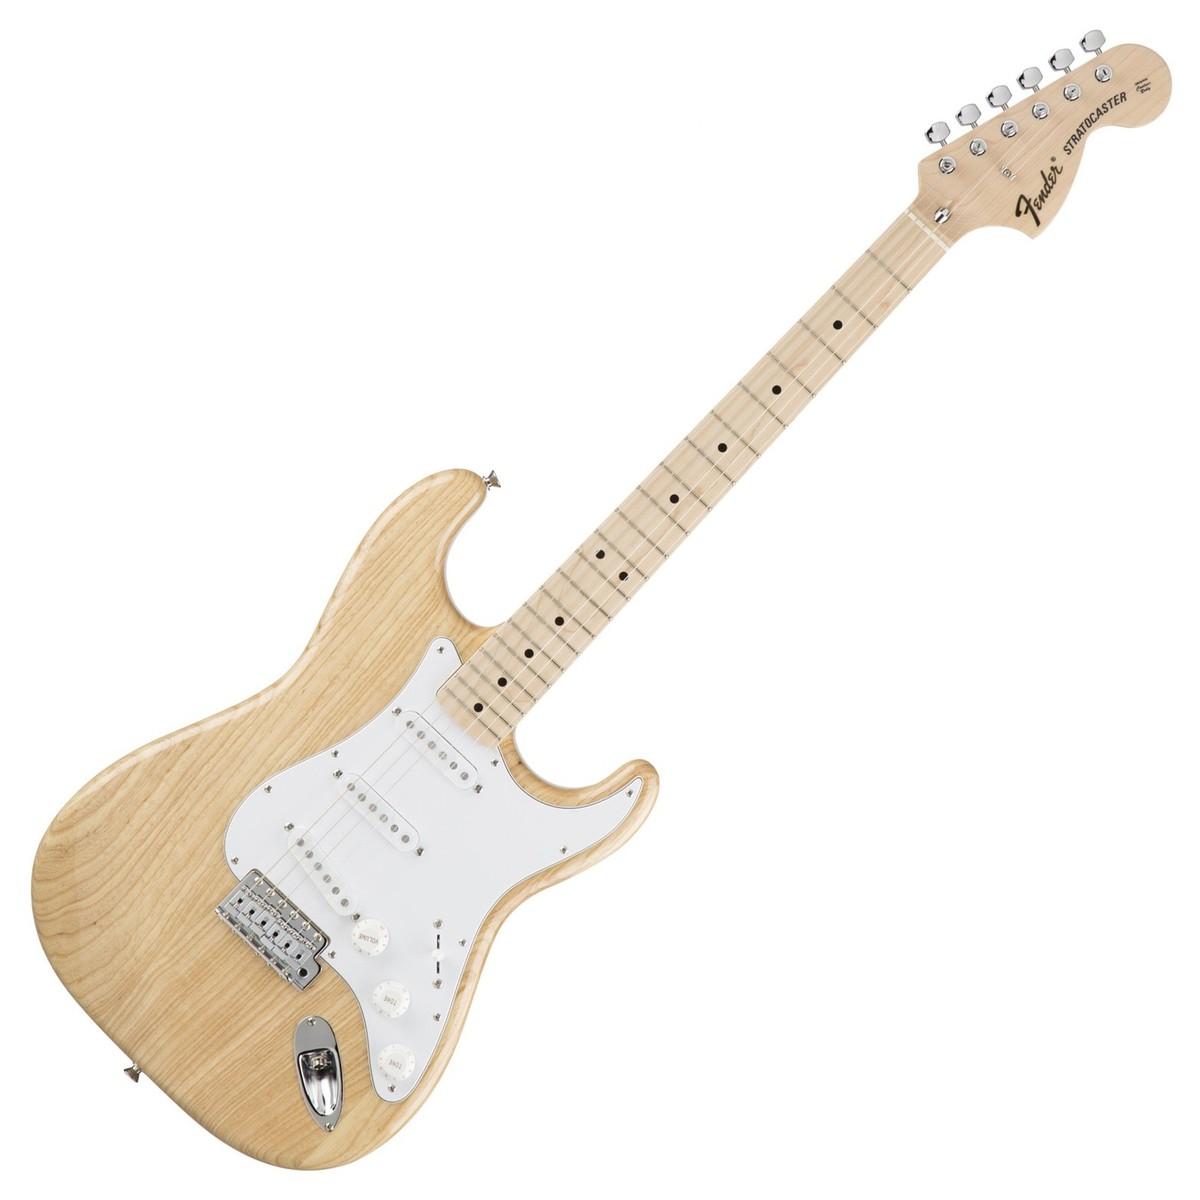 disc fender classique des ann es 70 guitare stratocaster. Black Bedroom Furniture Sets. Home Design Ideas